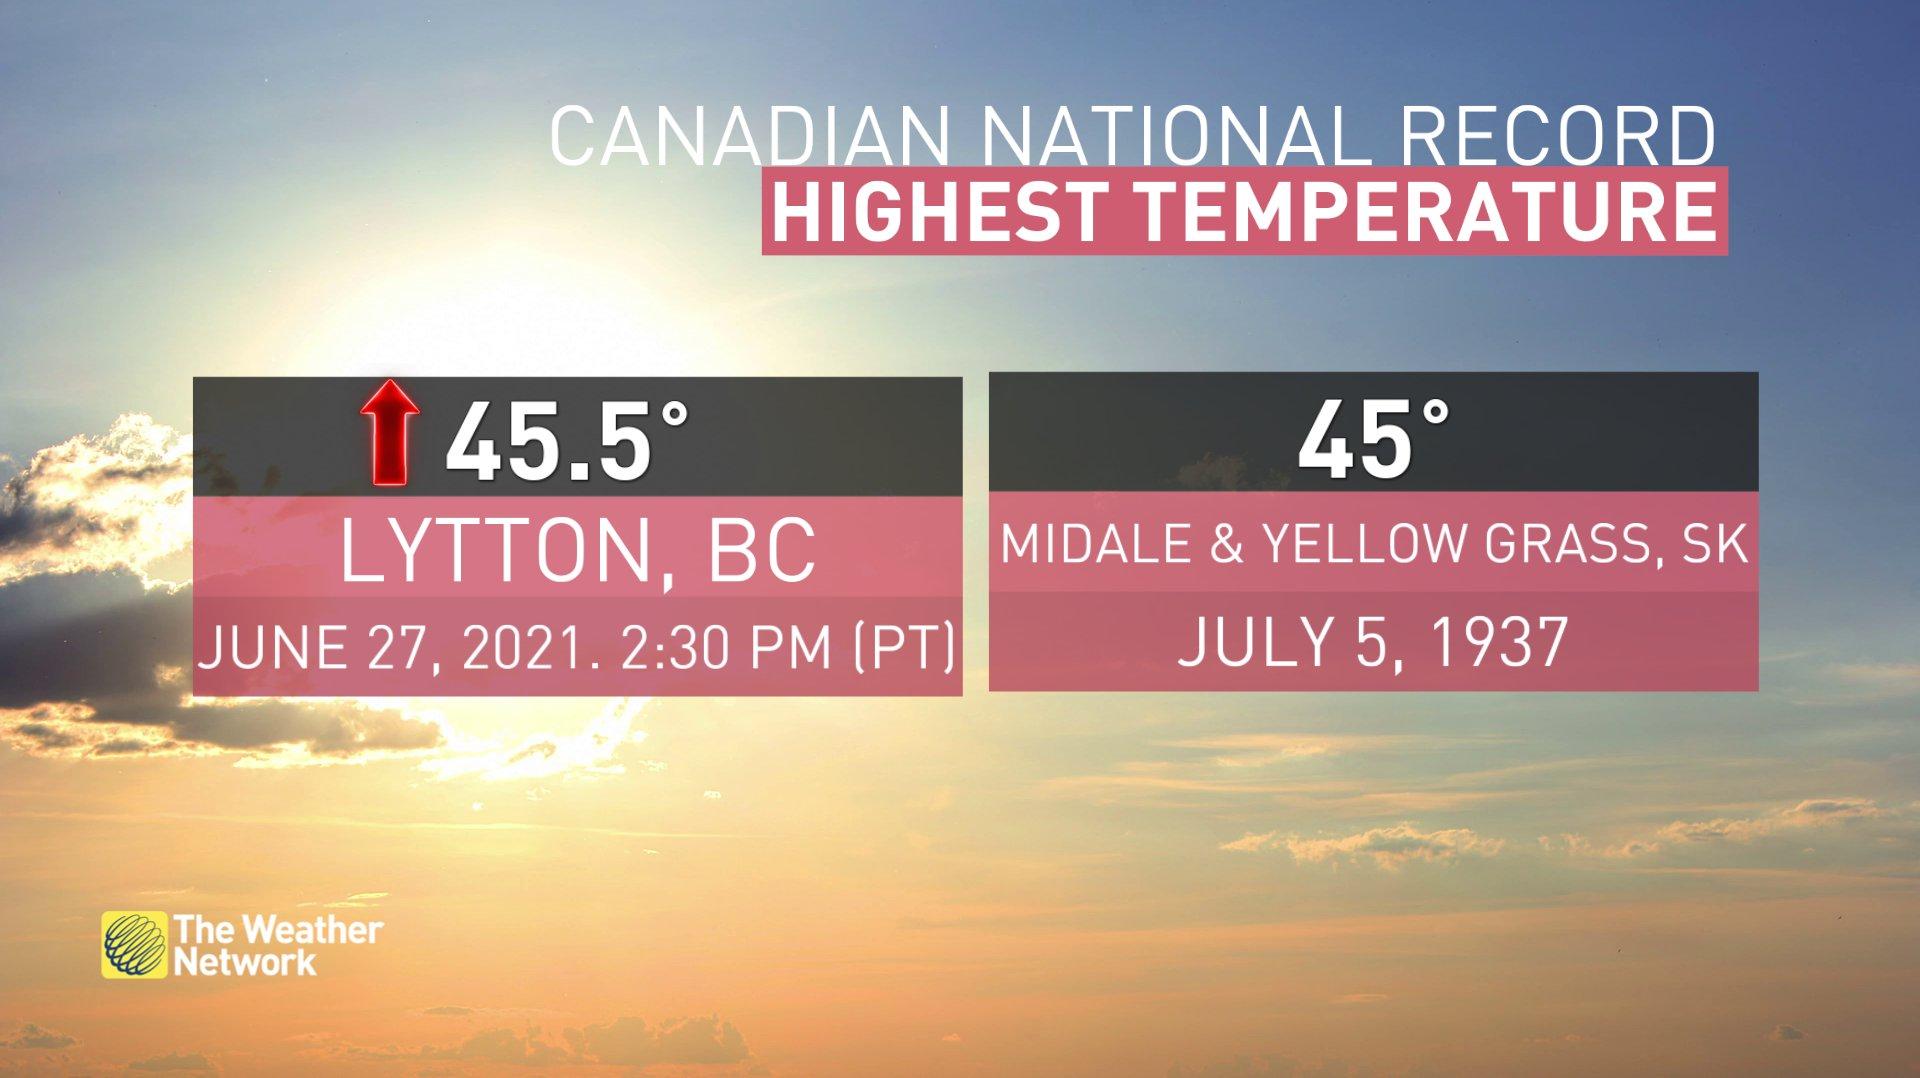 heat-dome-record-breaking-heatwave-pacific-northwest-canada-united-states-lytton-brittish-columbia